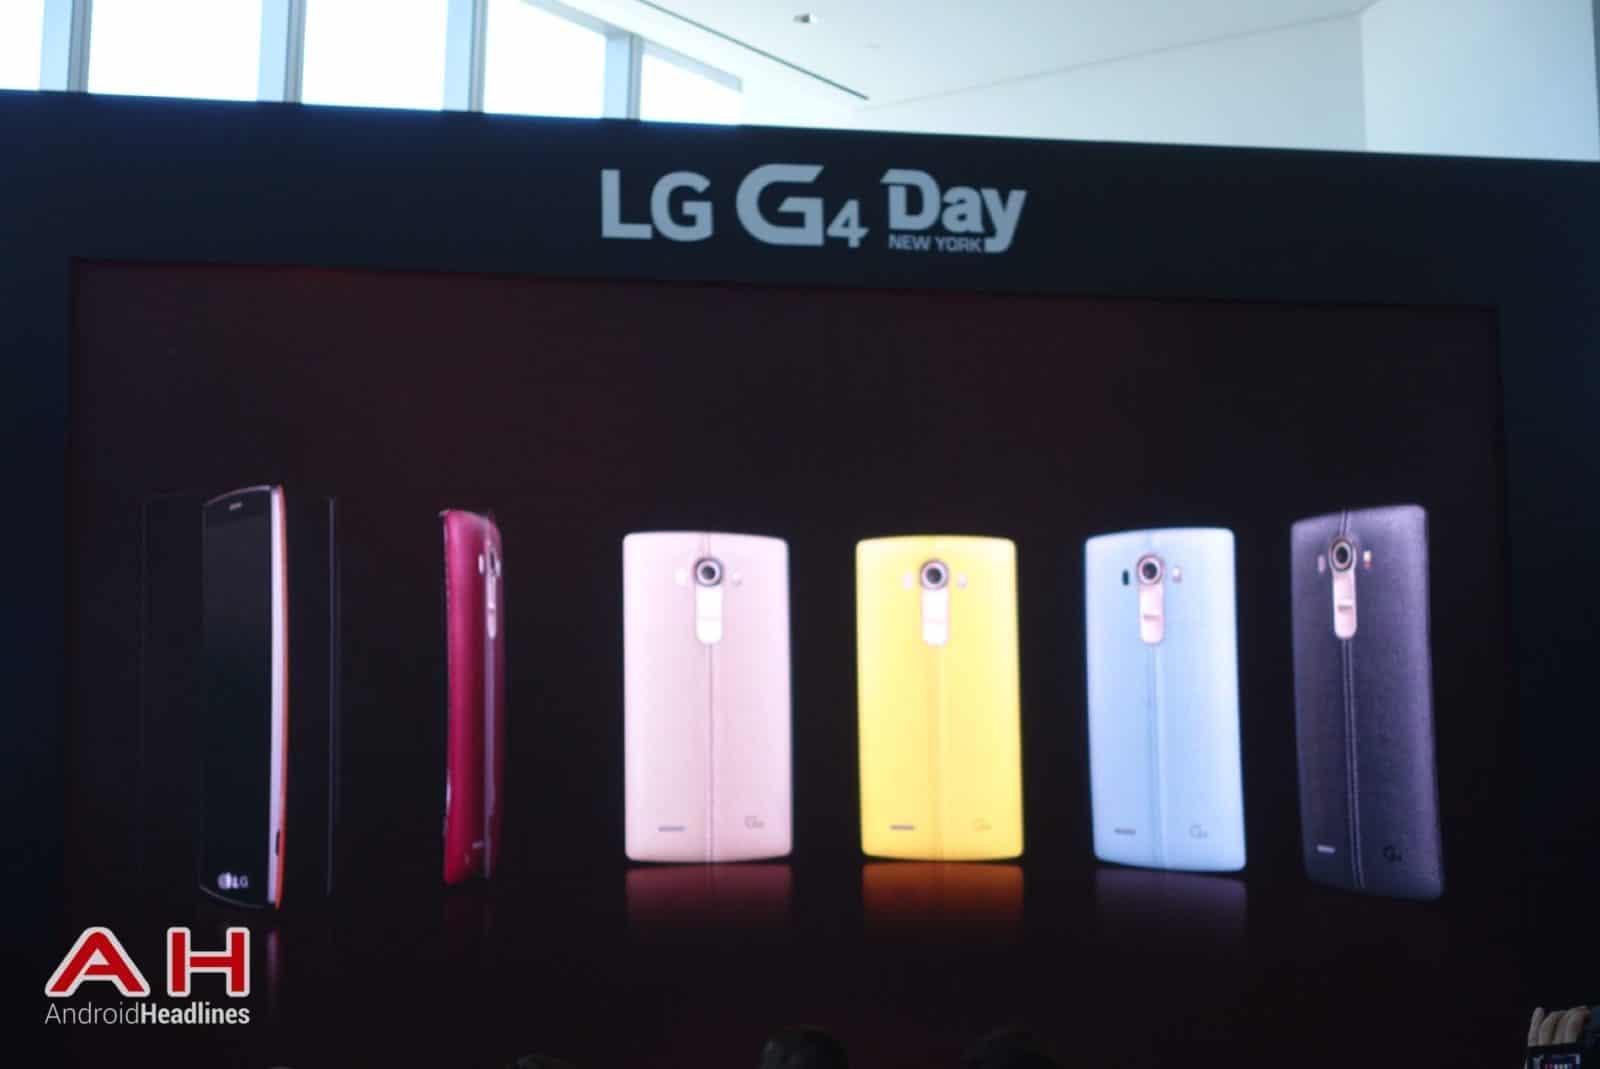 LG G4 Day AH 02 12